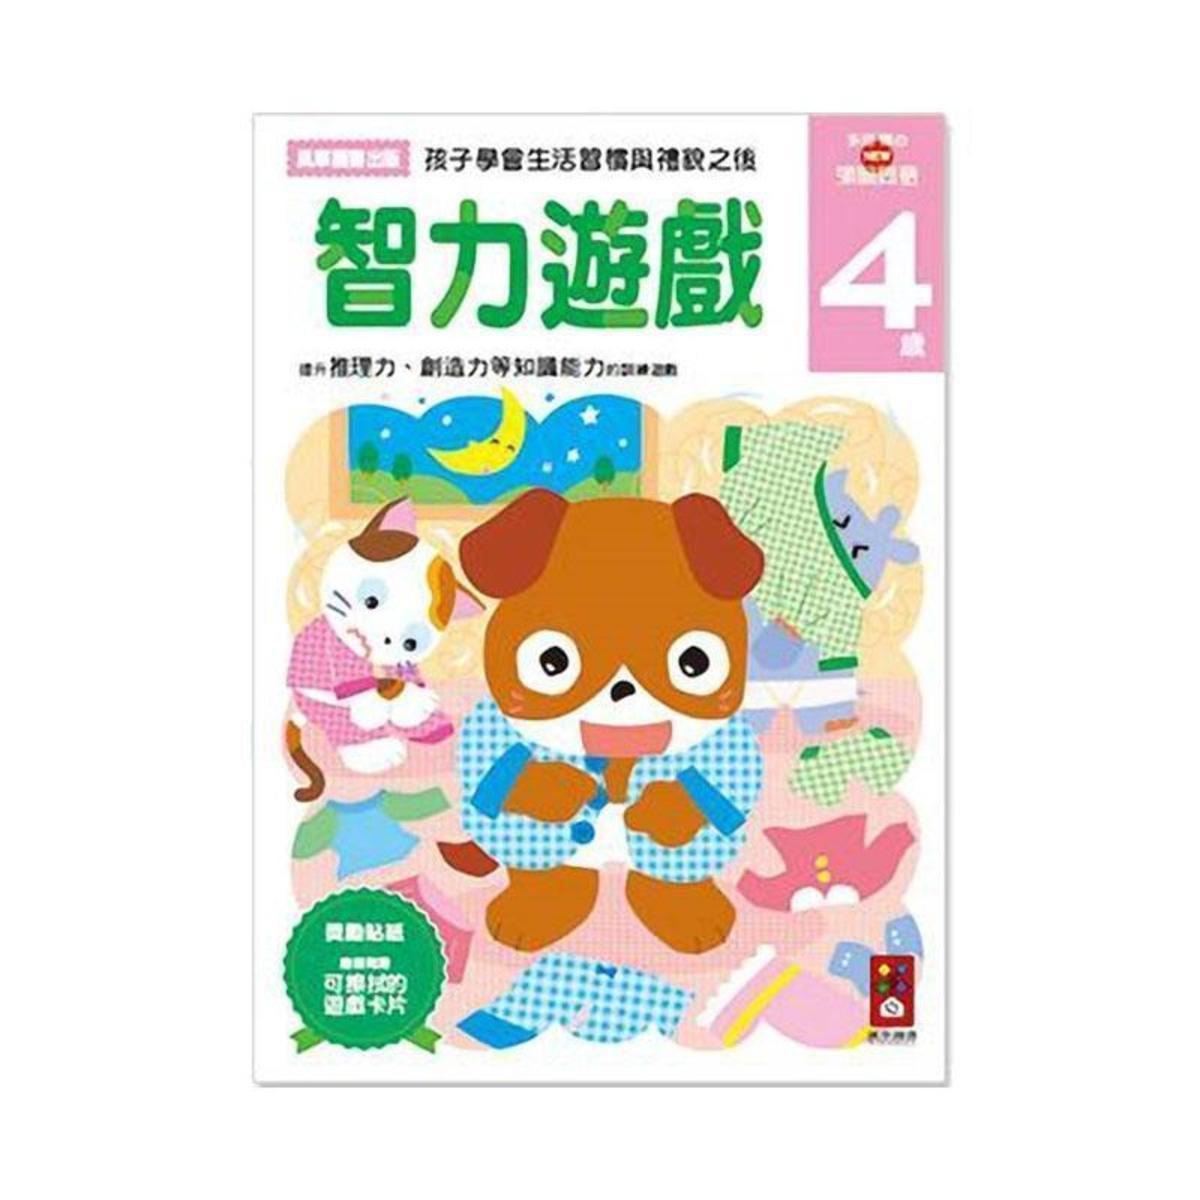 Publishing Intelligence Game 4 Years - Multi-Huhui's NEW Mind Development Taiwan Import